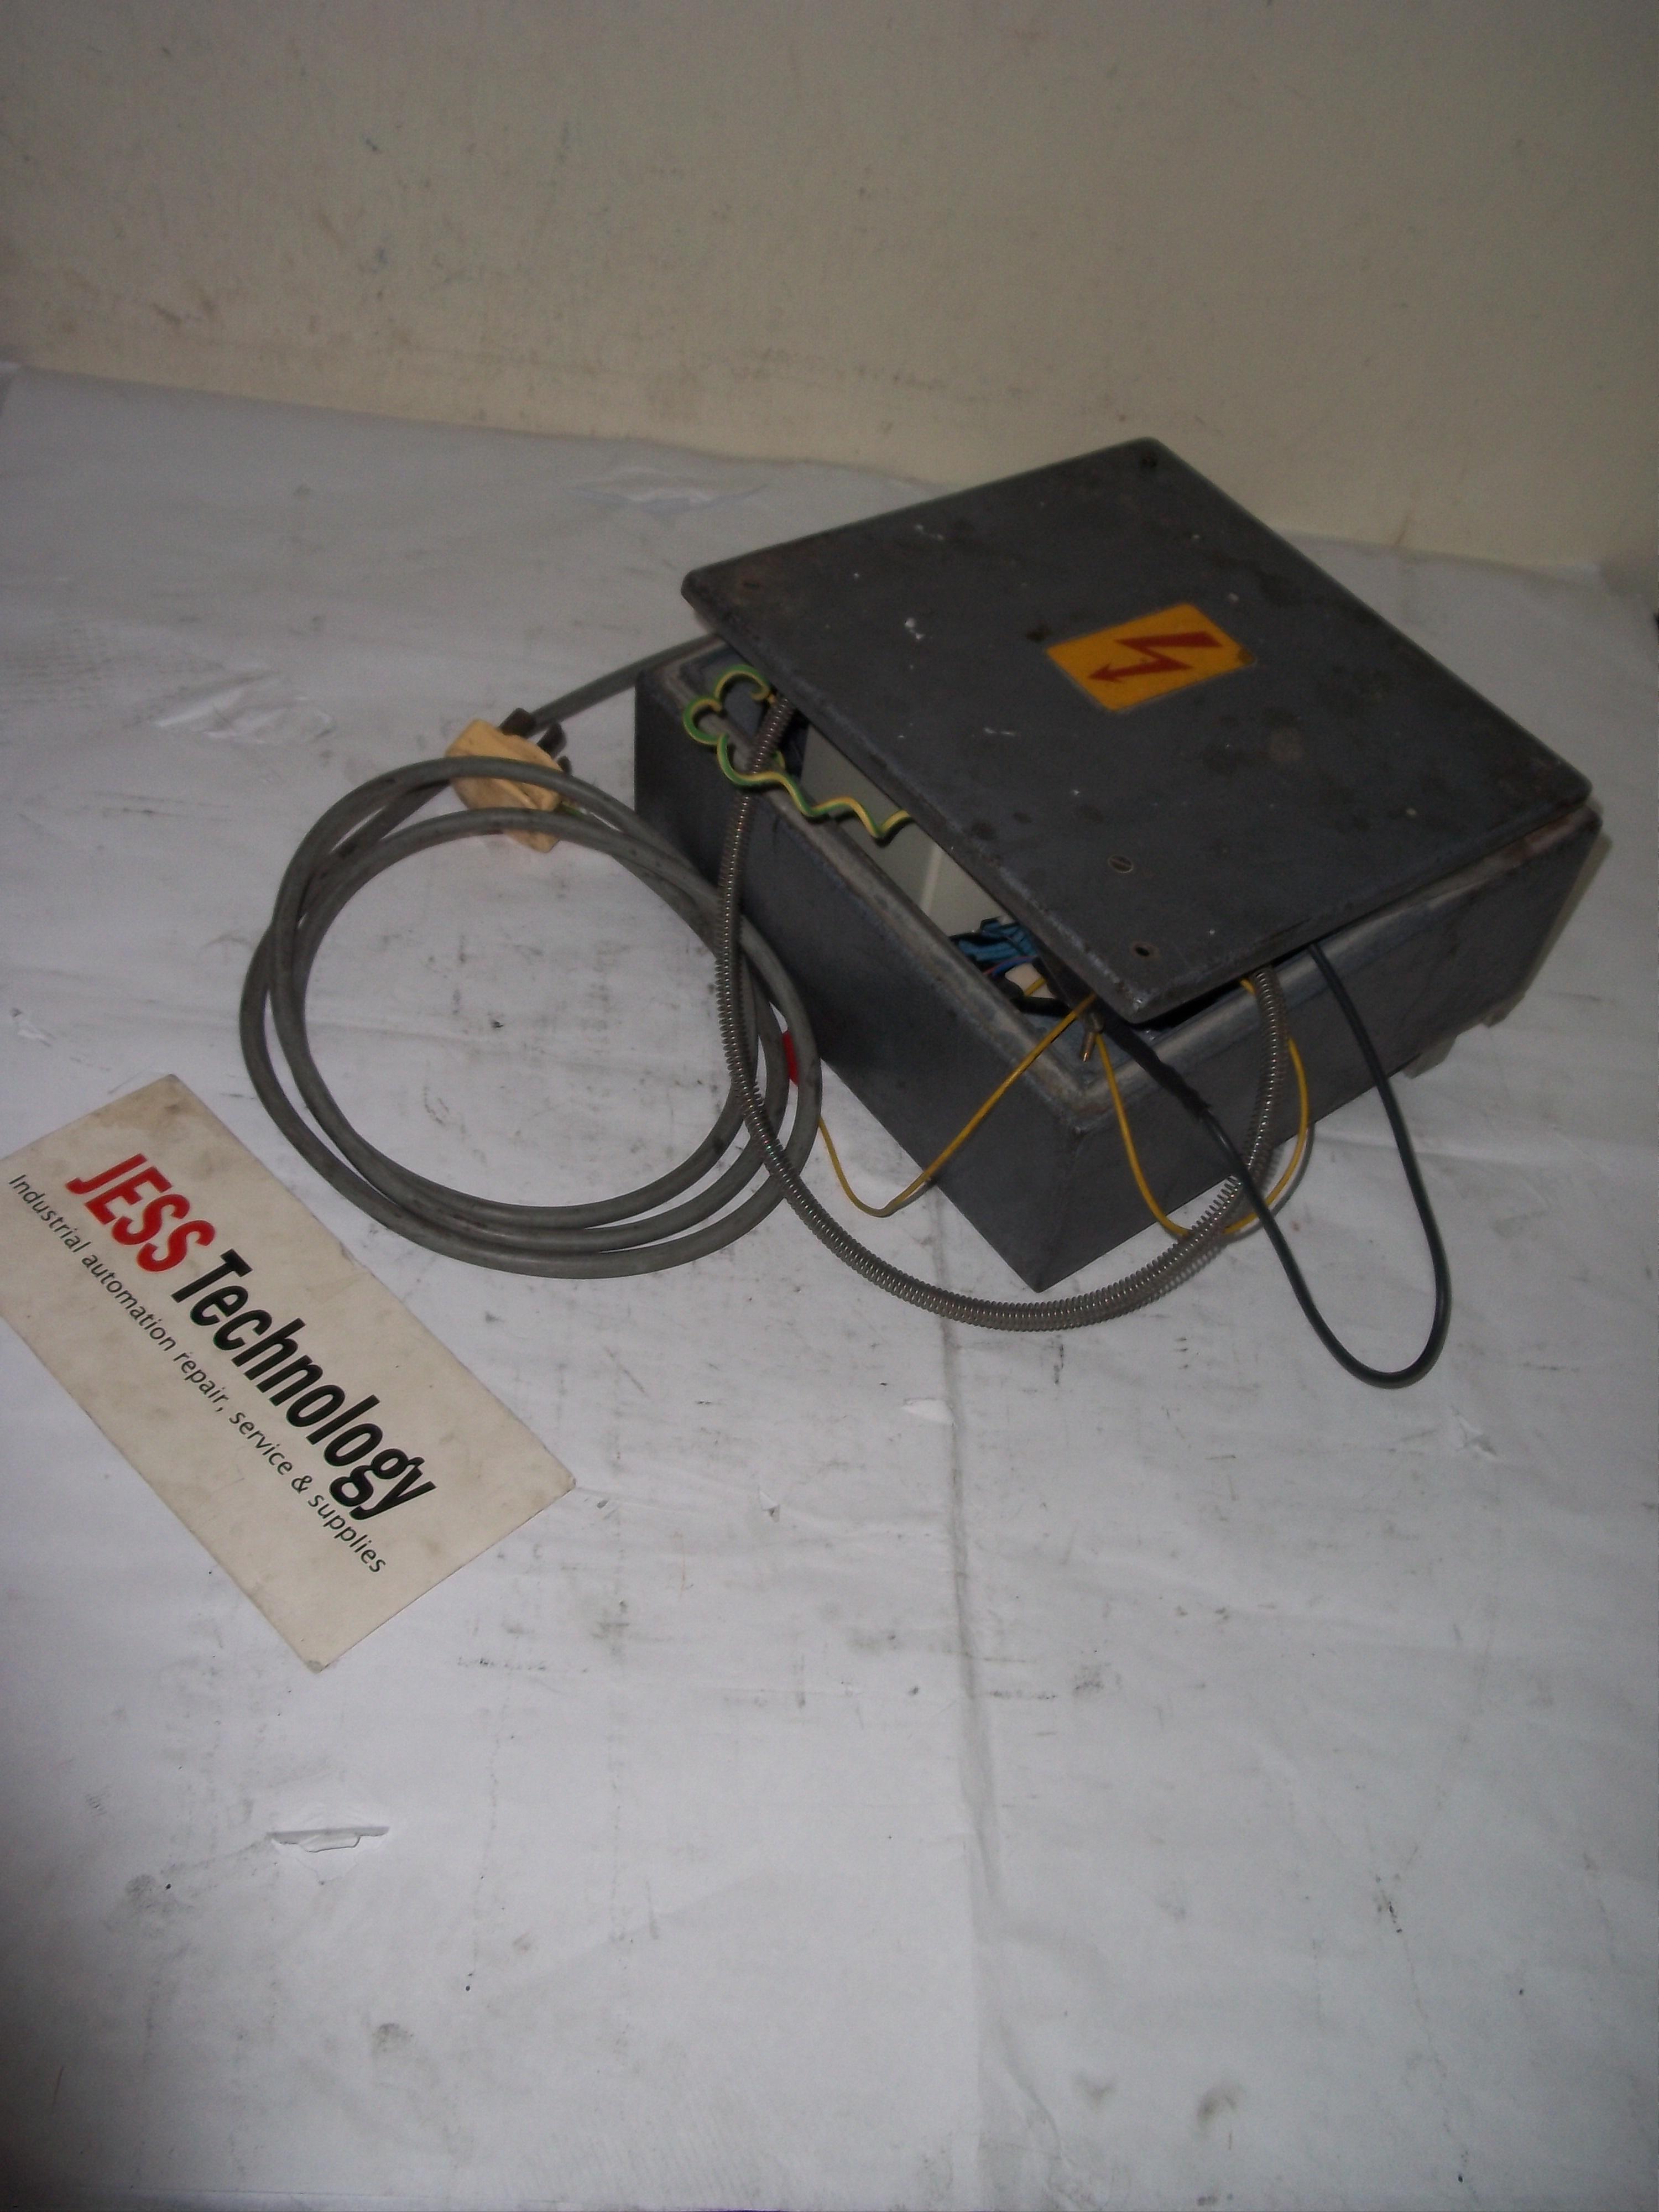 Repair GTE06 YAMAHA POWER SUPPLY UTE60 in Malaysia, Singapore, Thailand, Indonesia